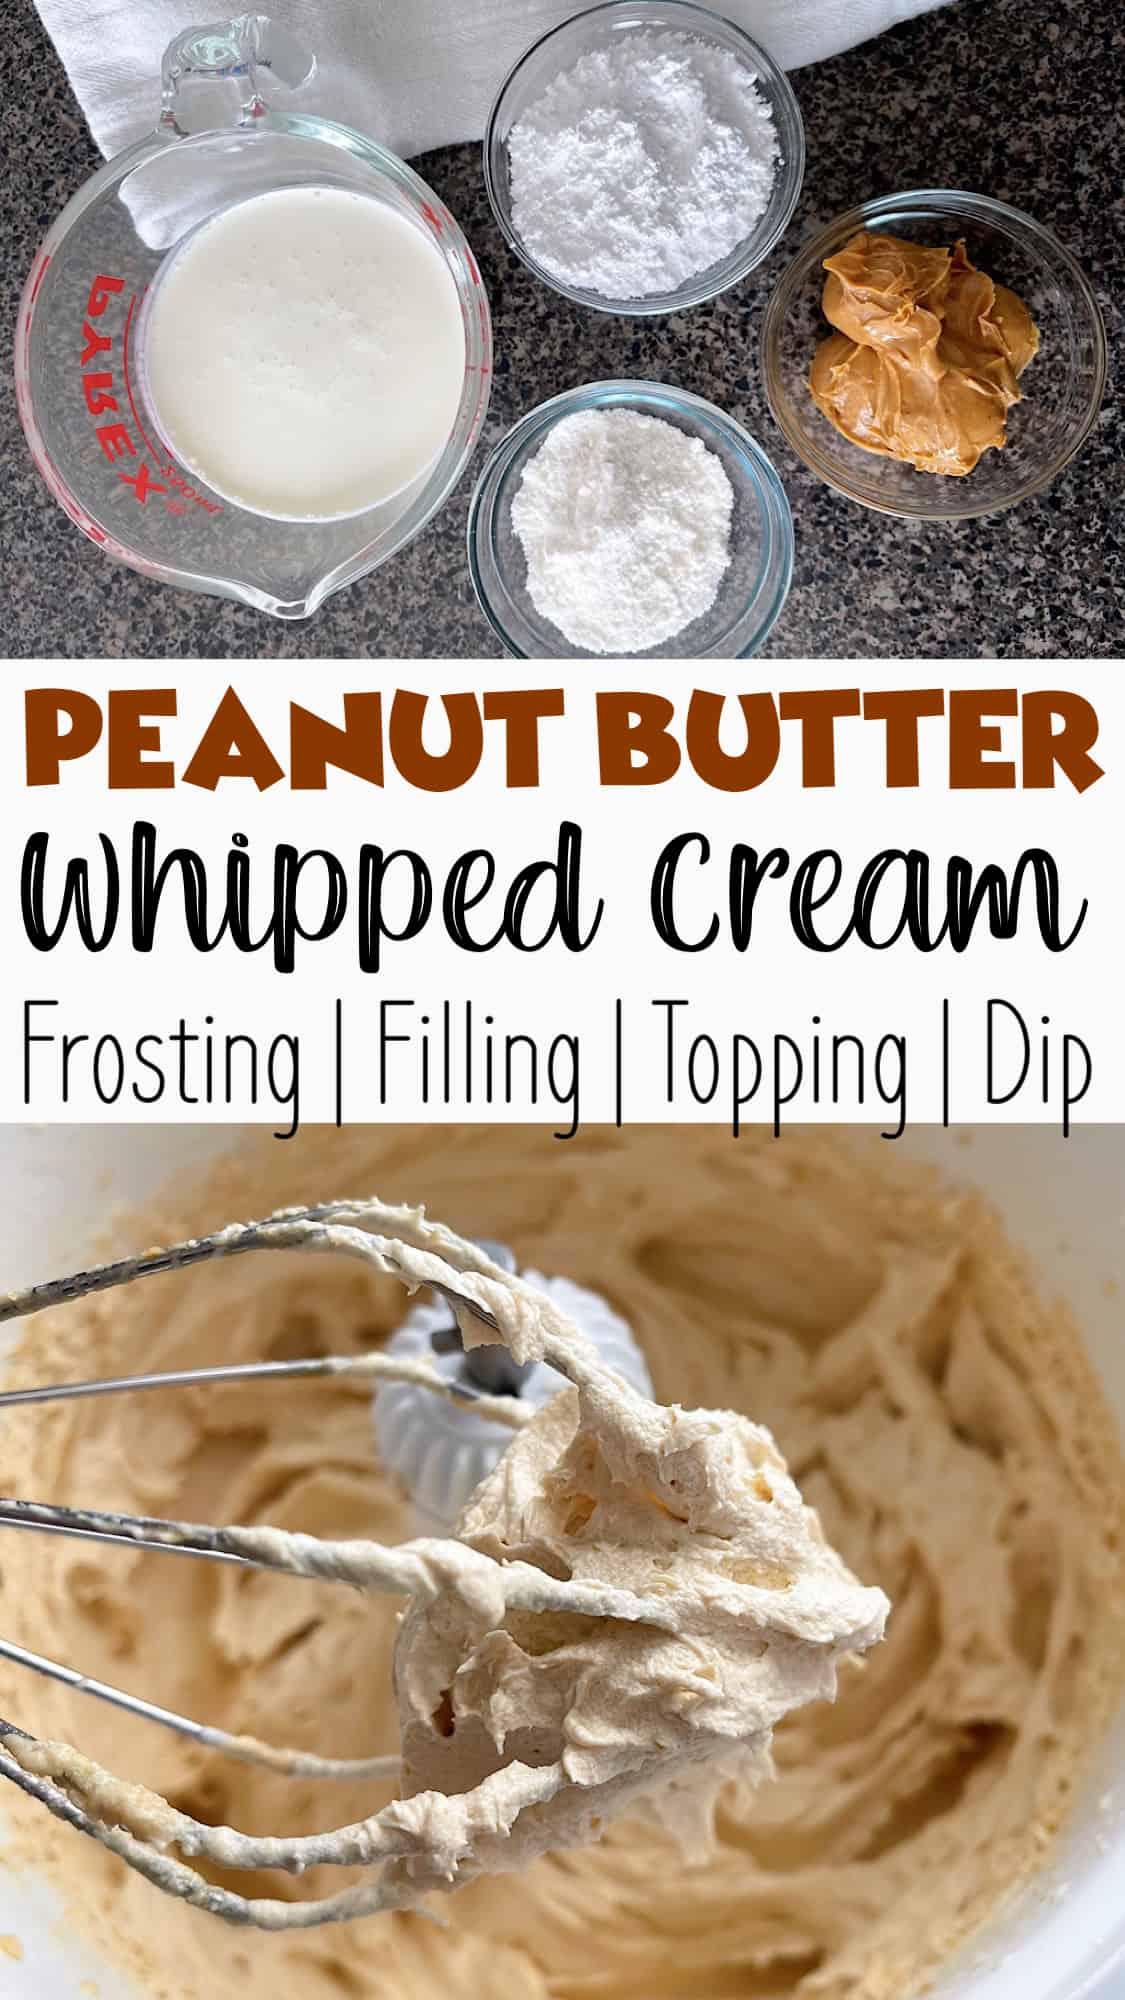 Peanut Butter Whipped Cream Pinterest image.